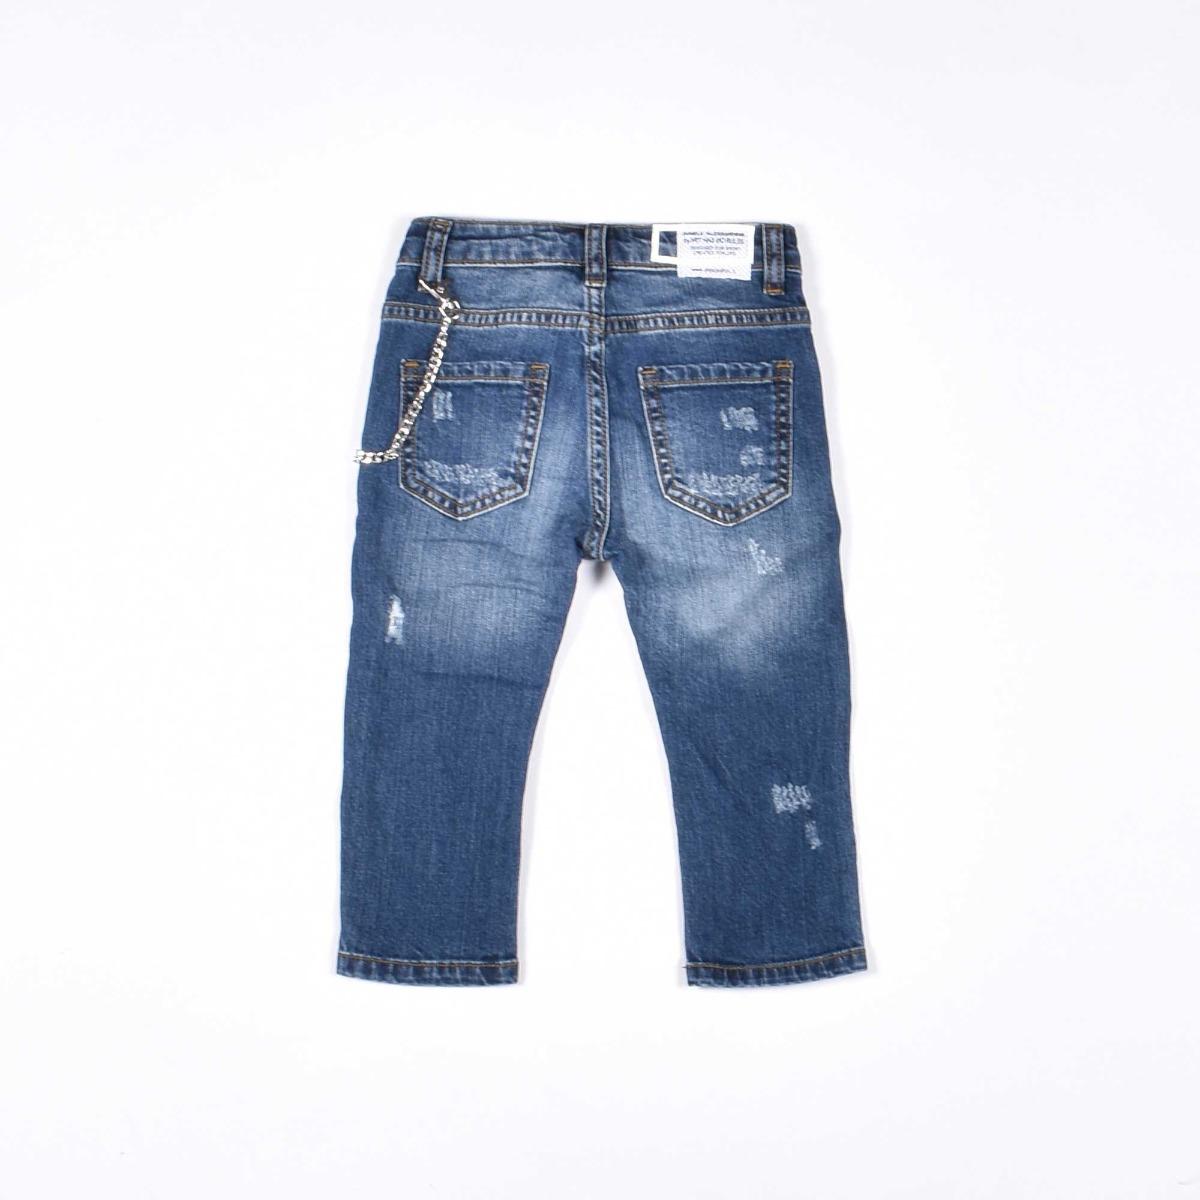 Jeans con catenina di perle - Denim